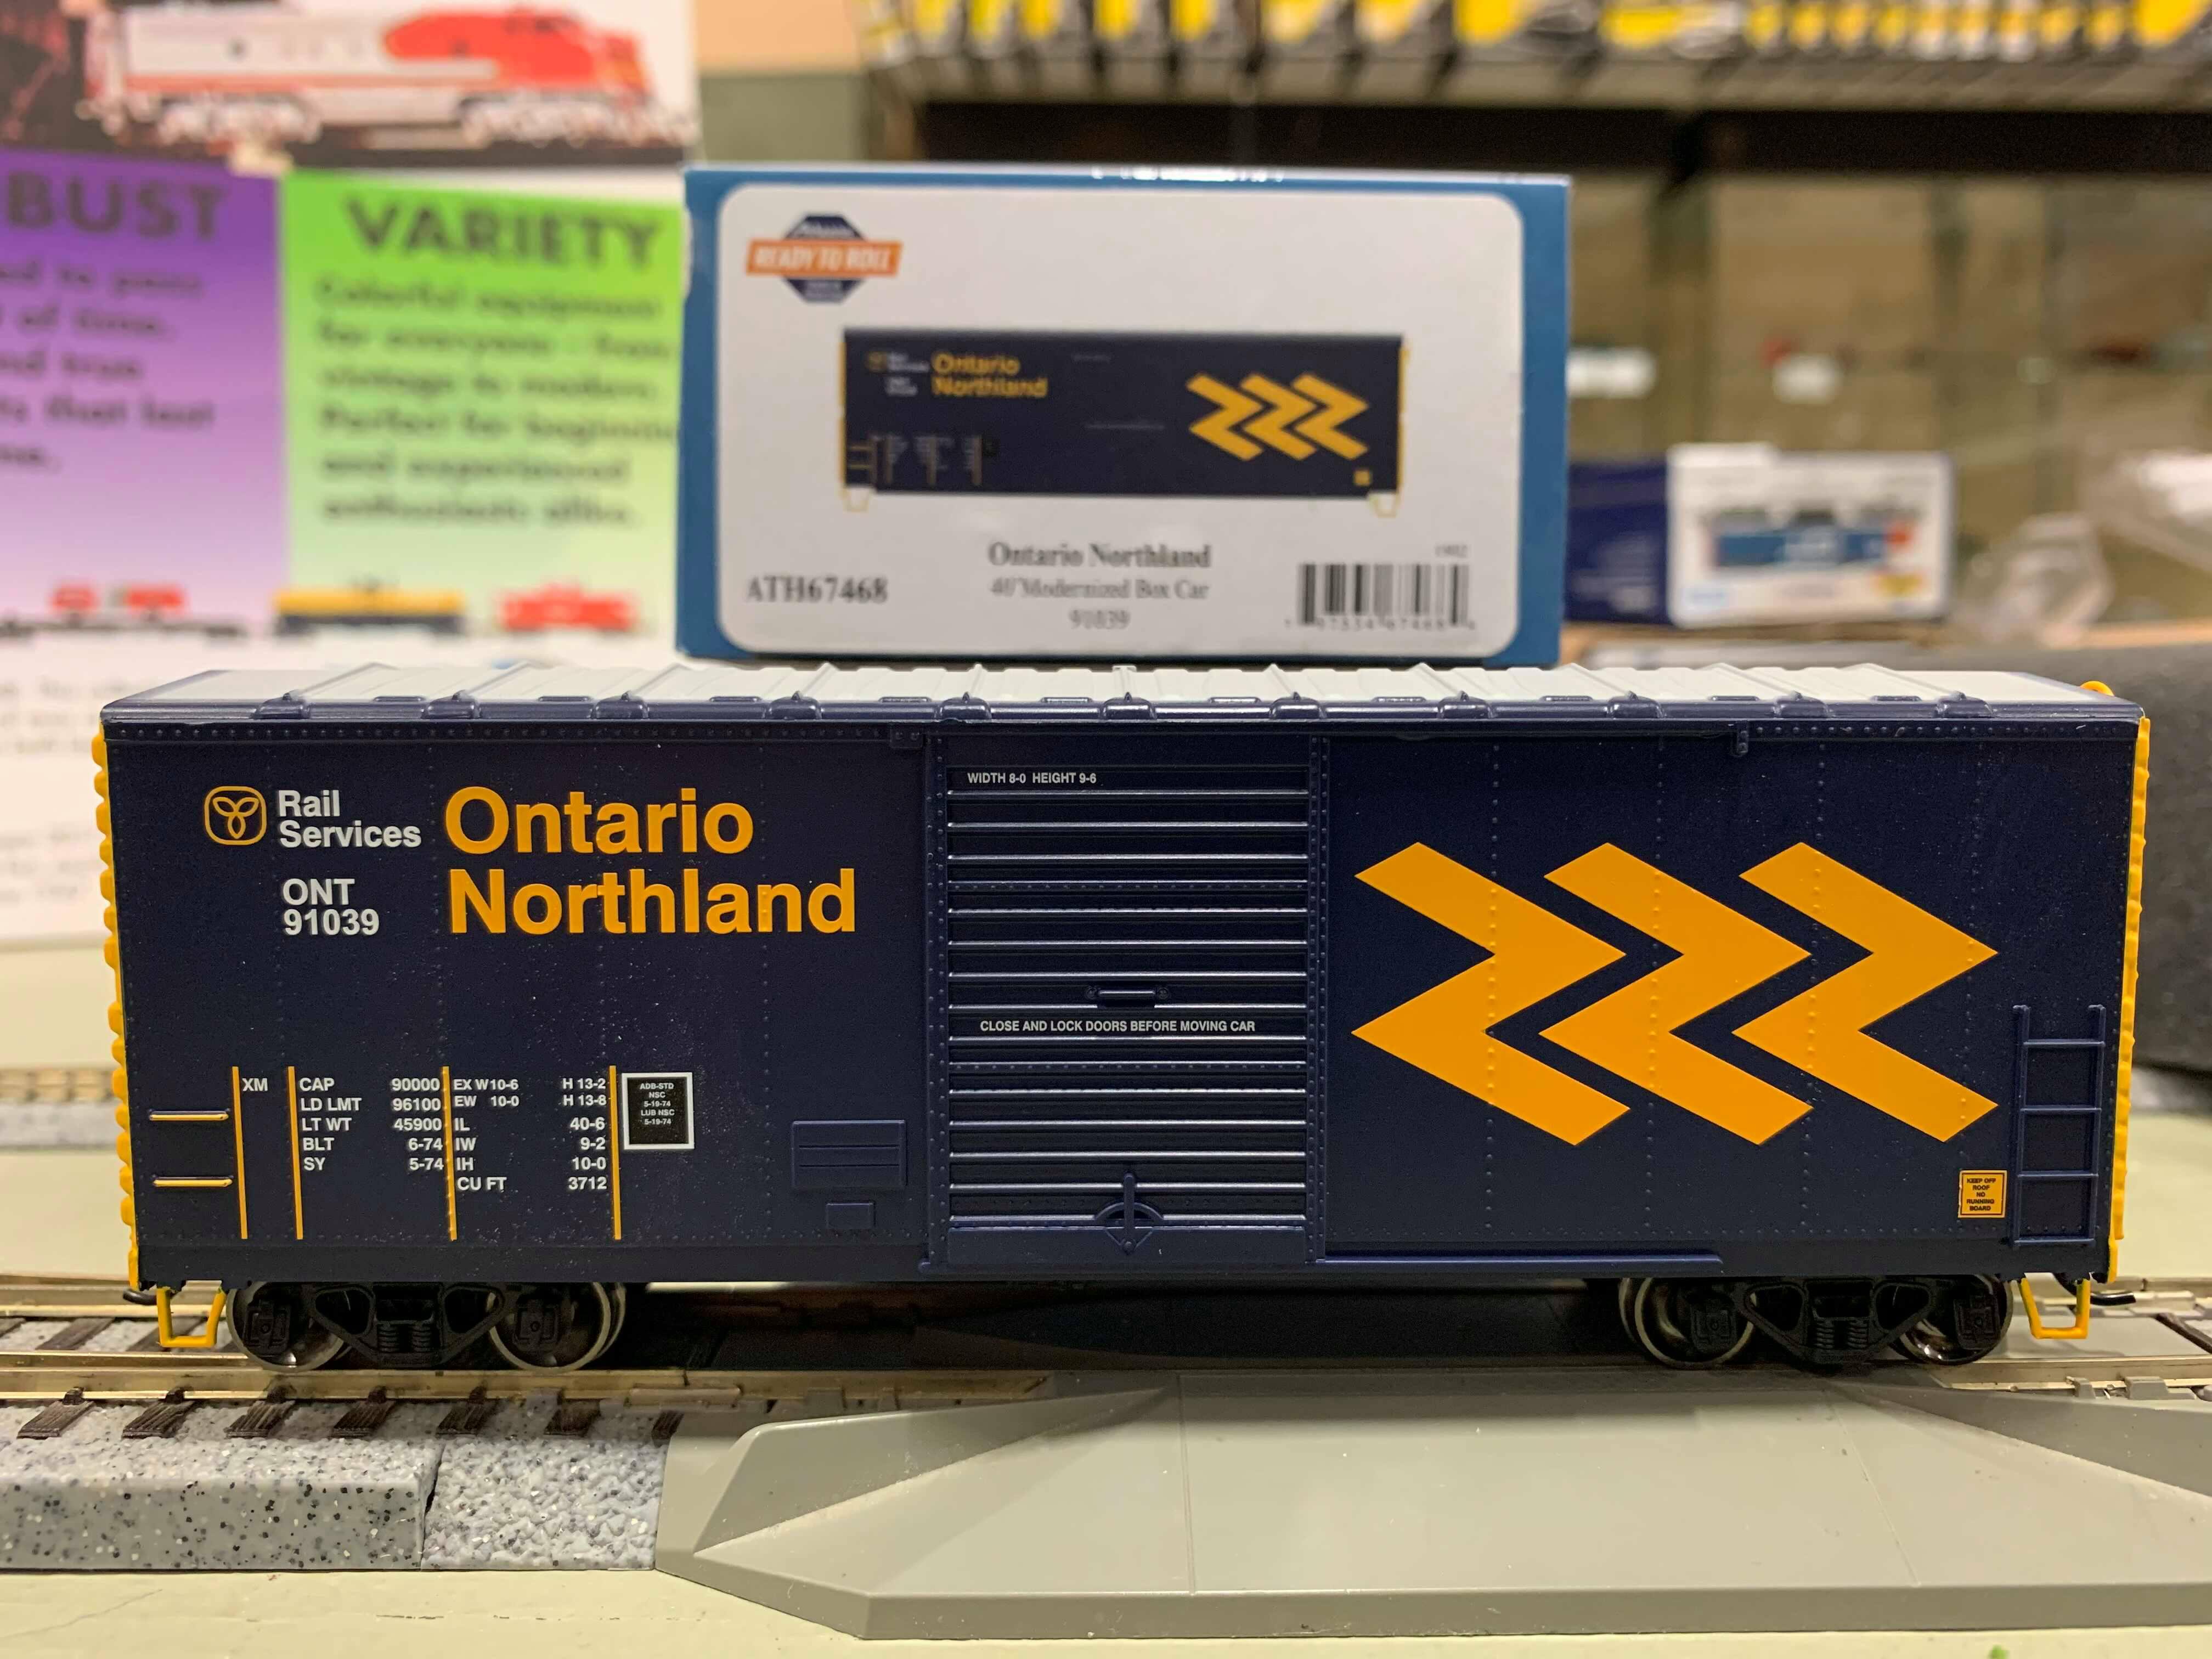 Athearn RTR 67466 HO - 40 Ft Modernized Box - Ontario Northland Railroad (ONR) #91019